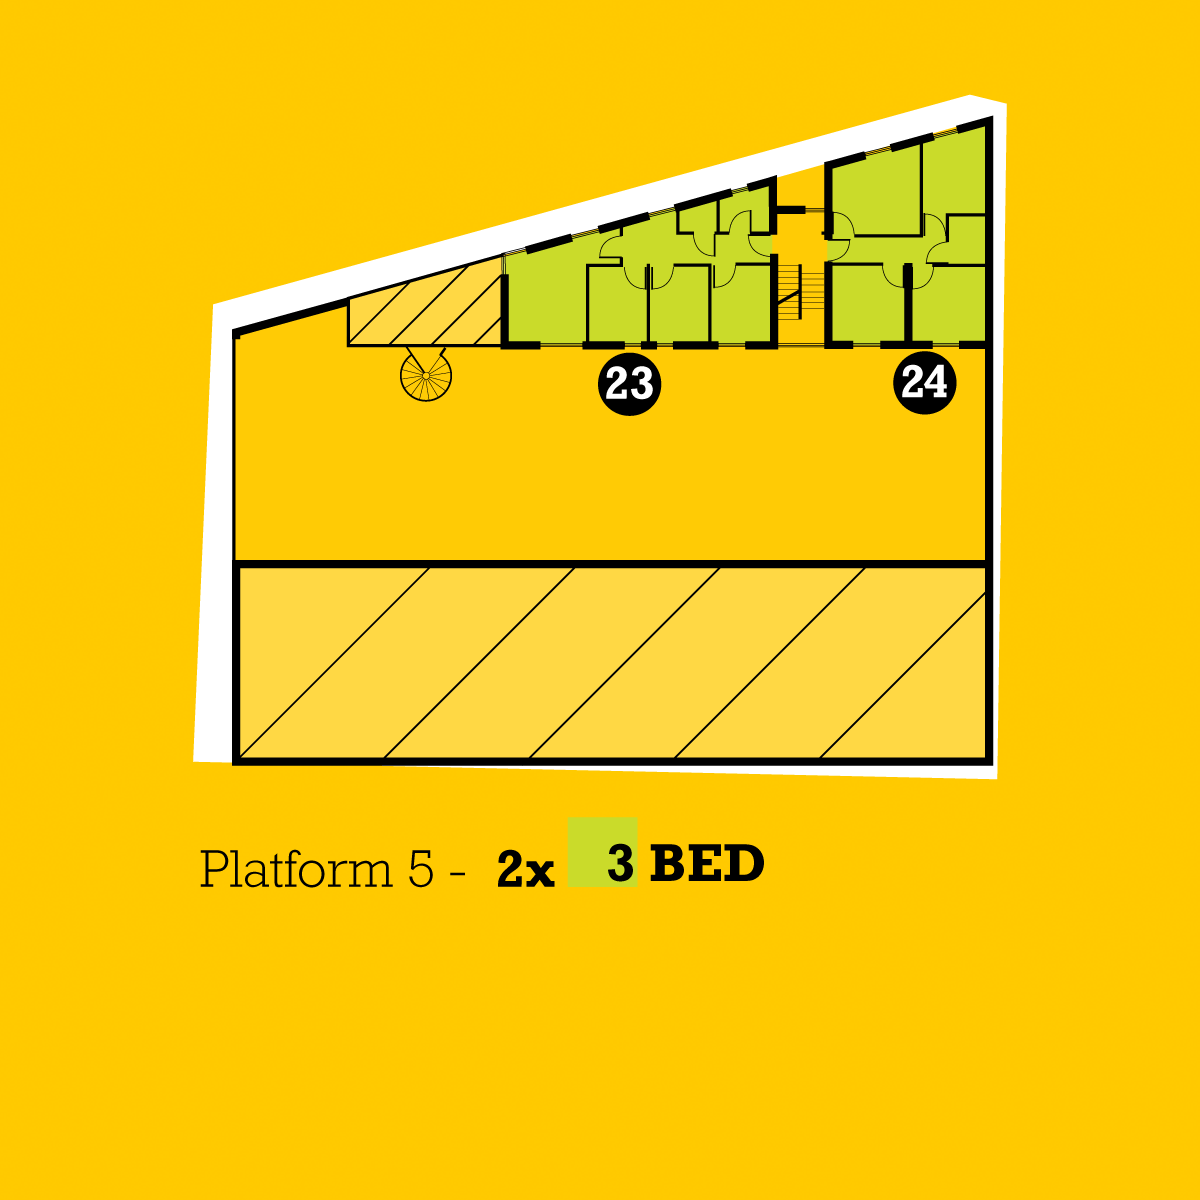 The Platform plans floor 5